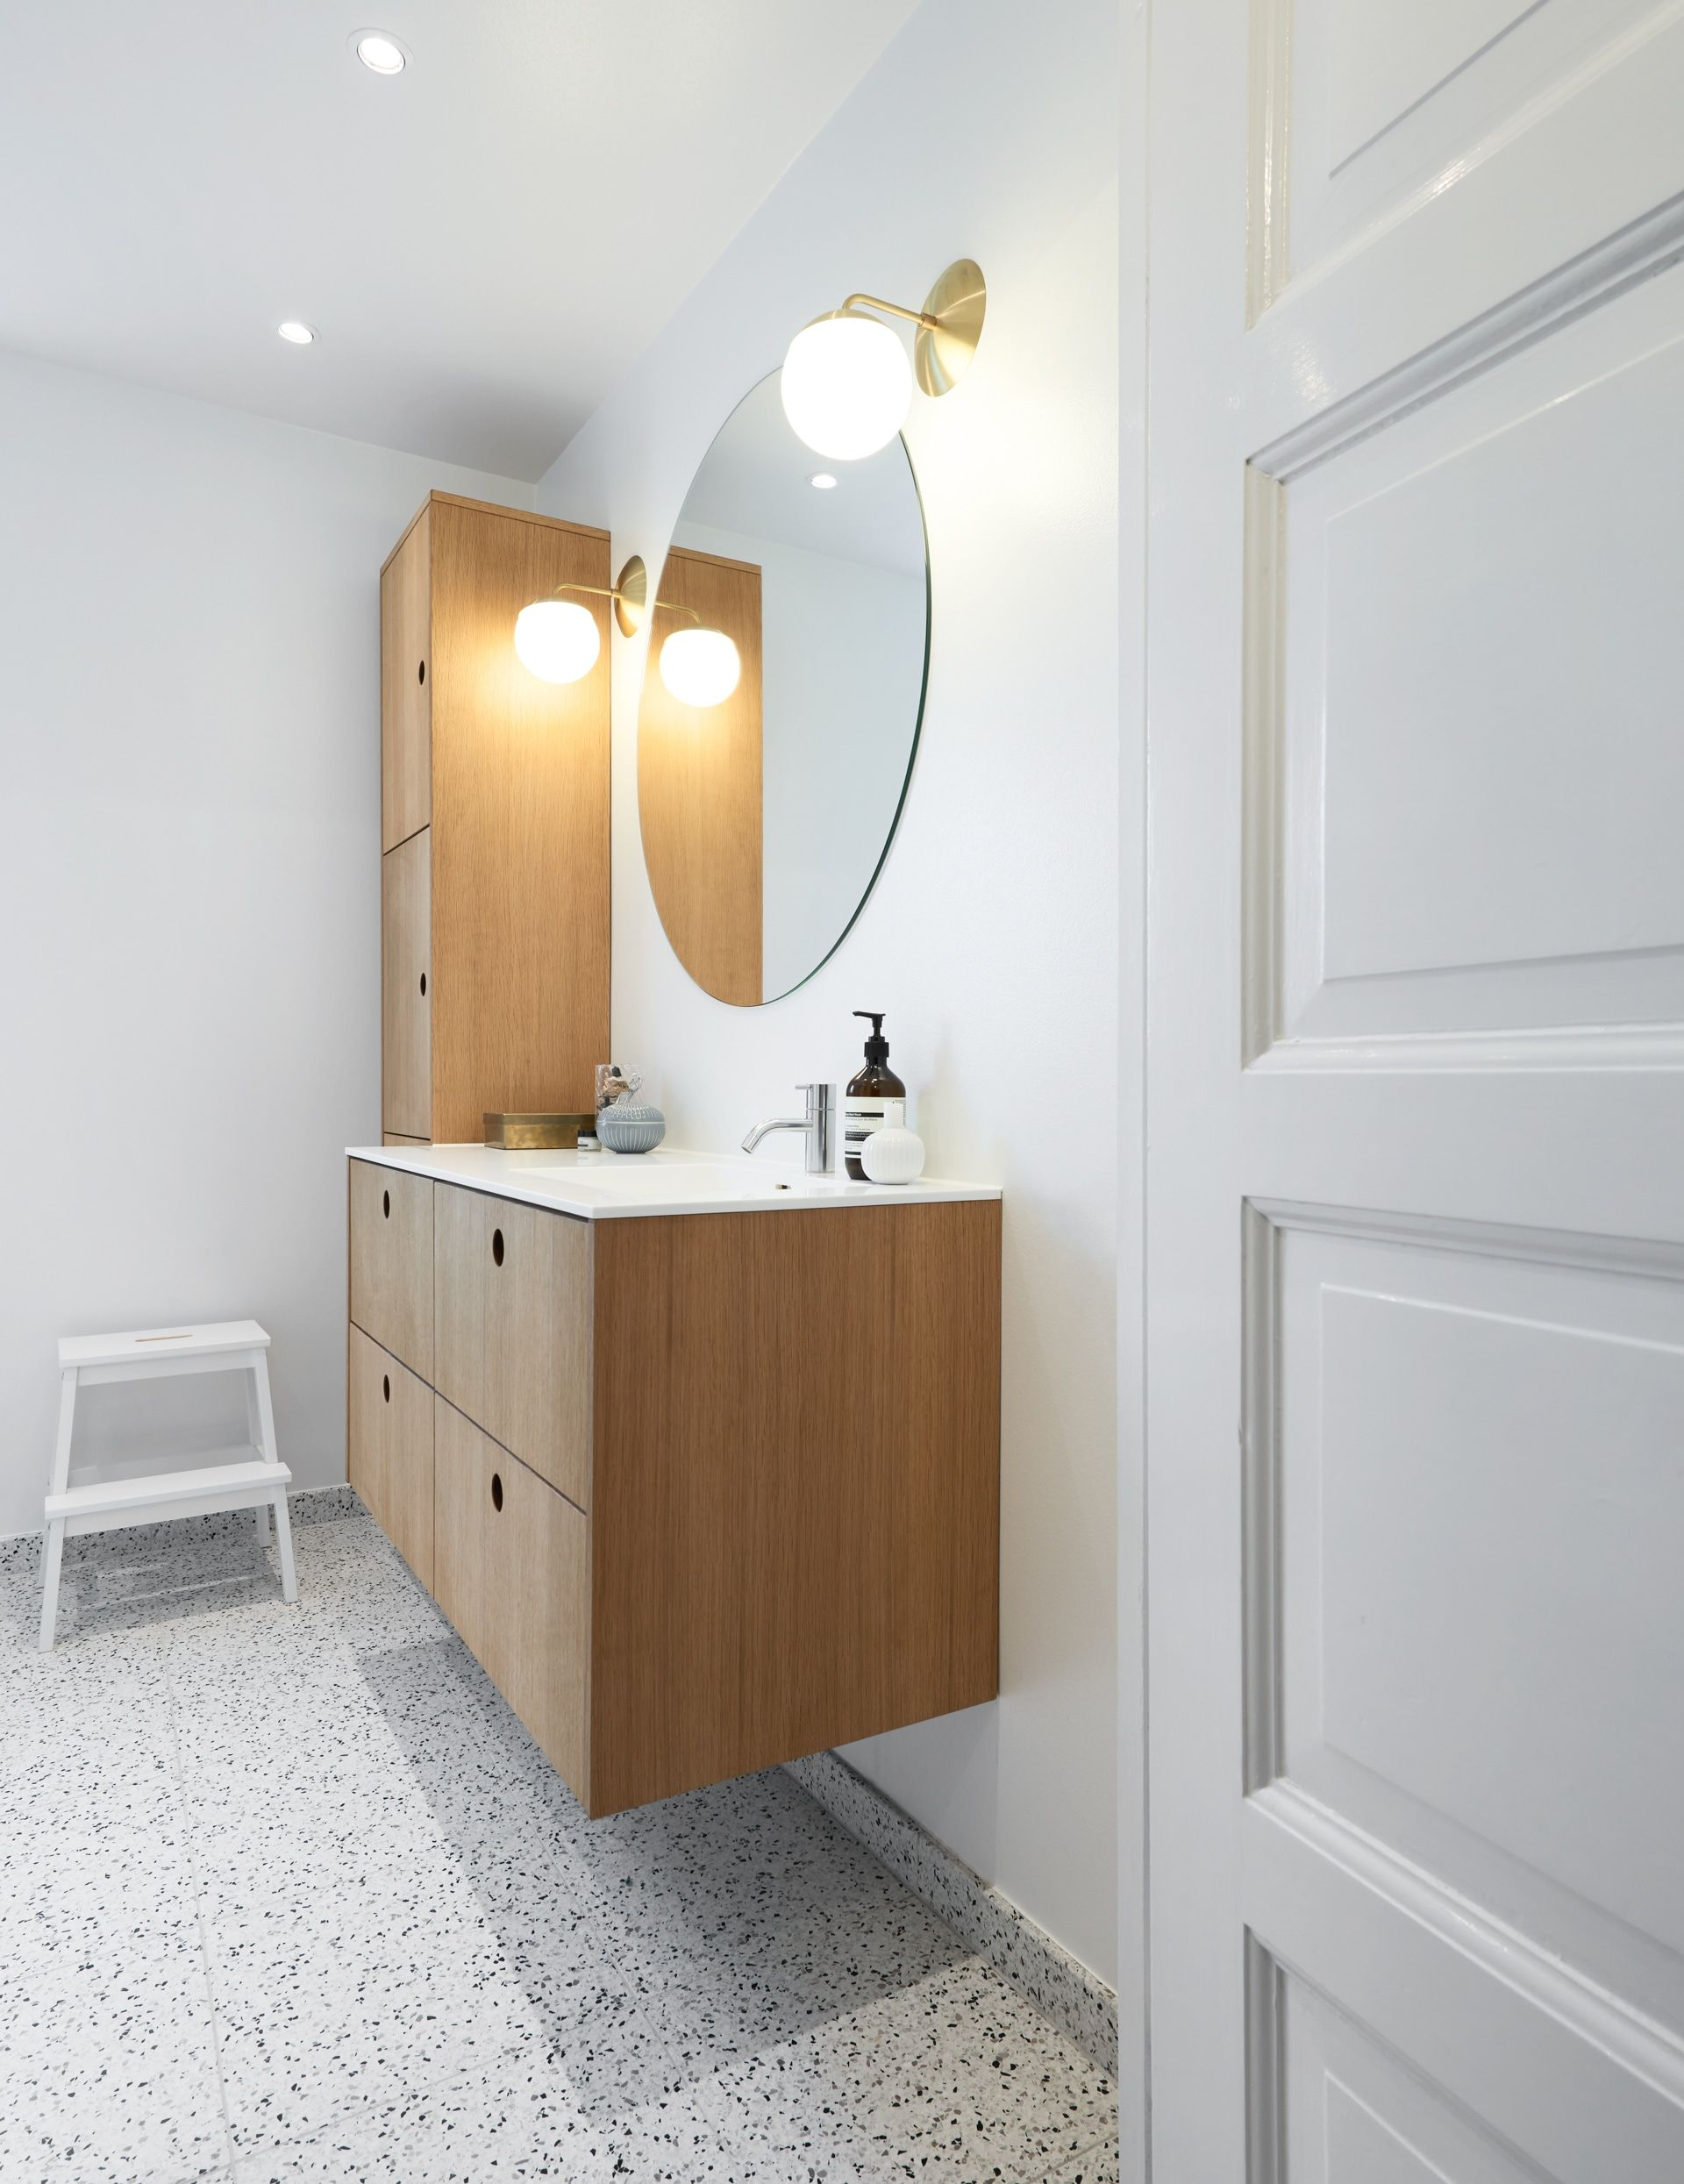 Limfjordsvej in Vanløse, Denmark | Bathrooms | Pinterest | Ikea hack ...